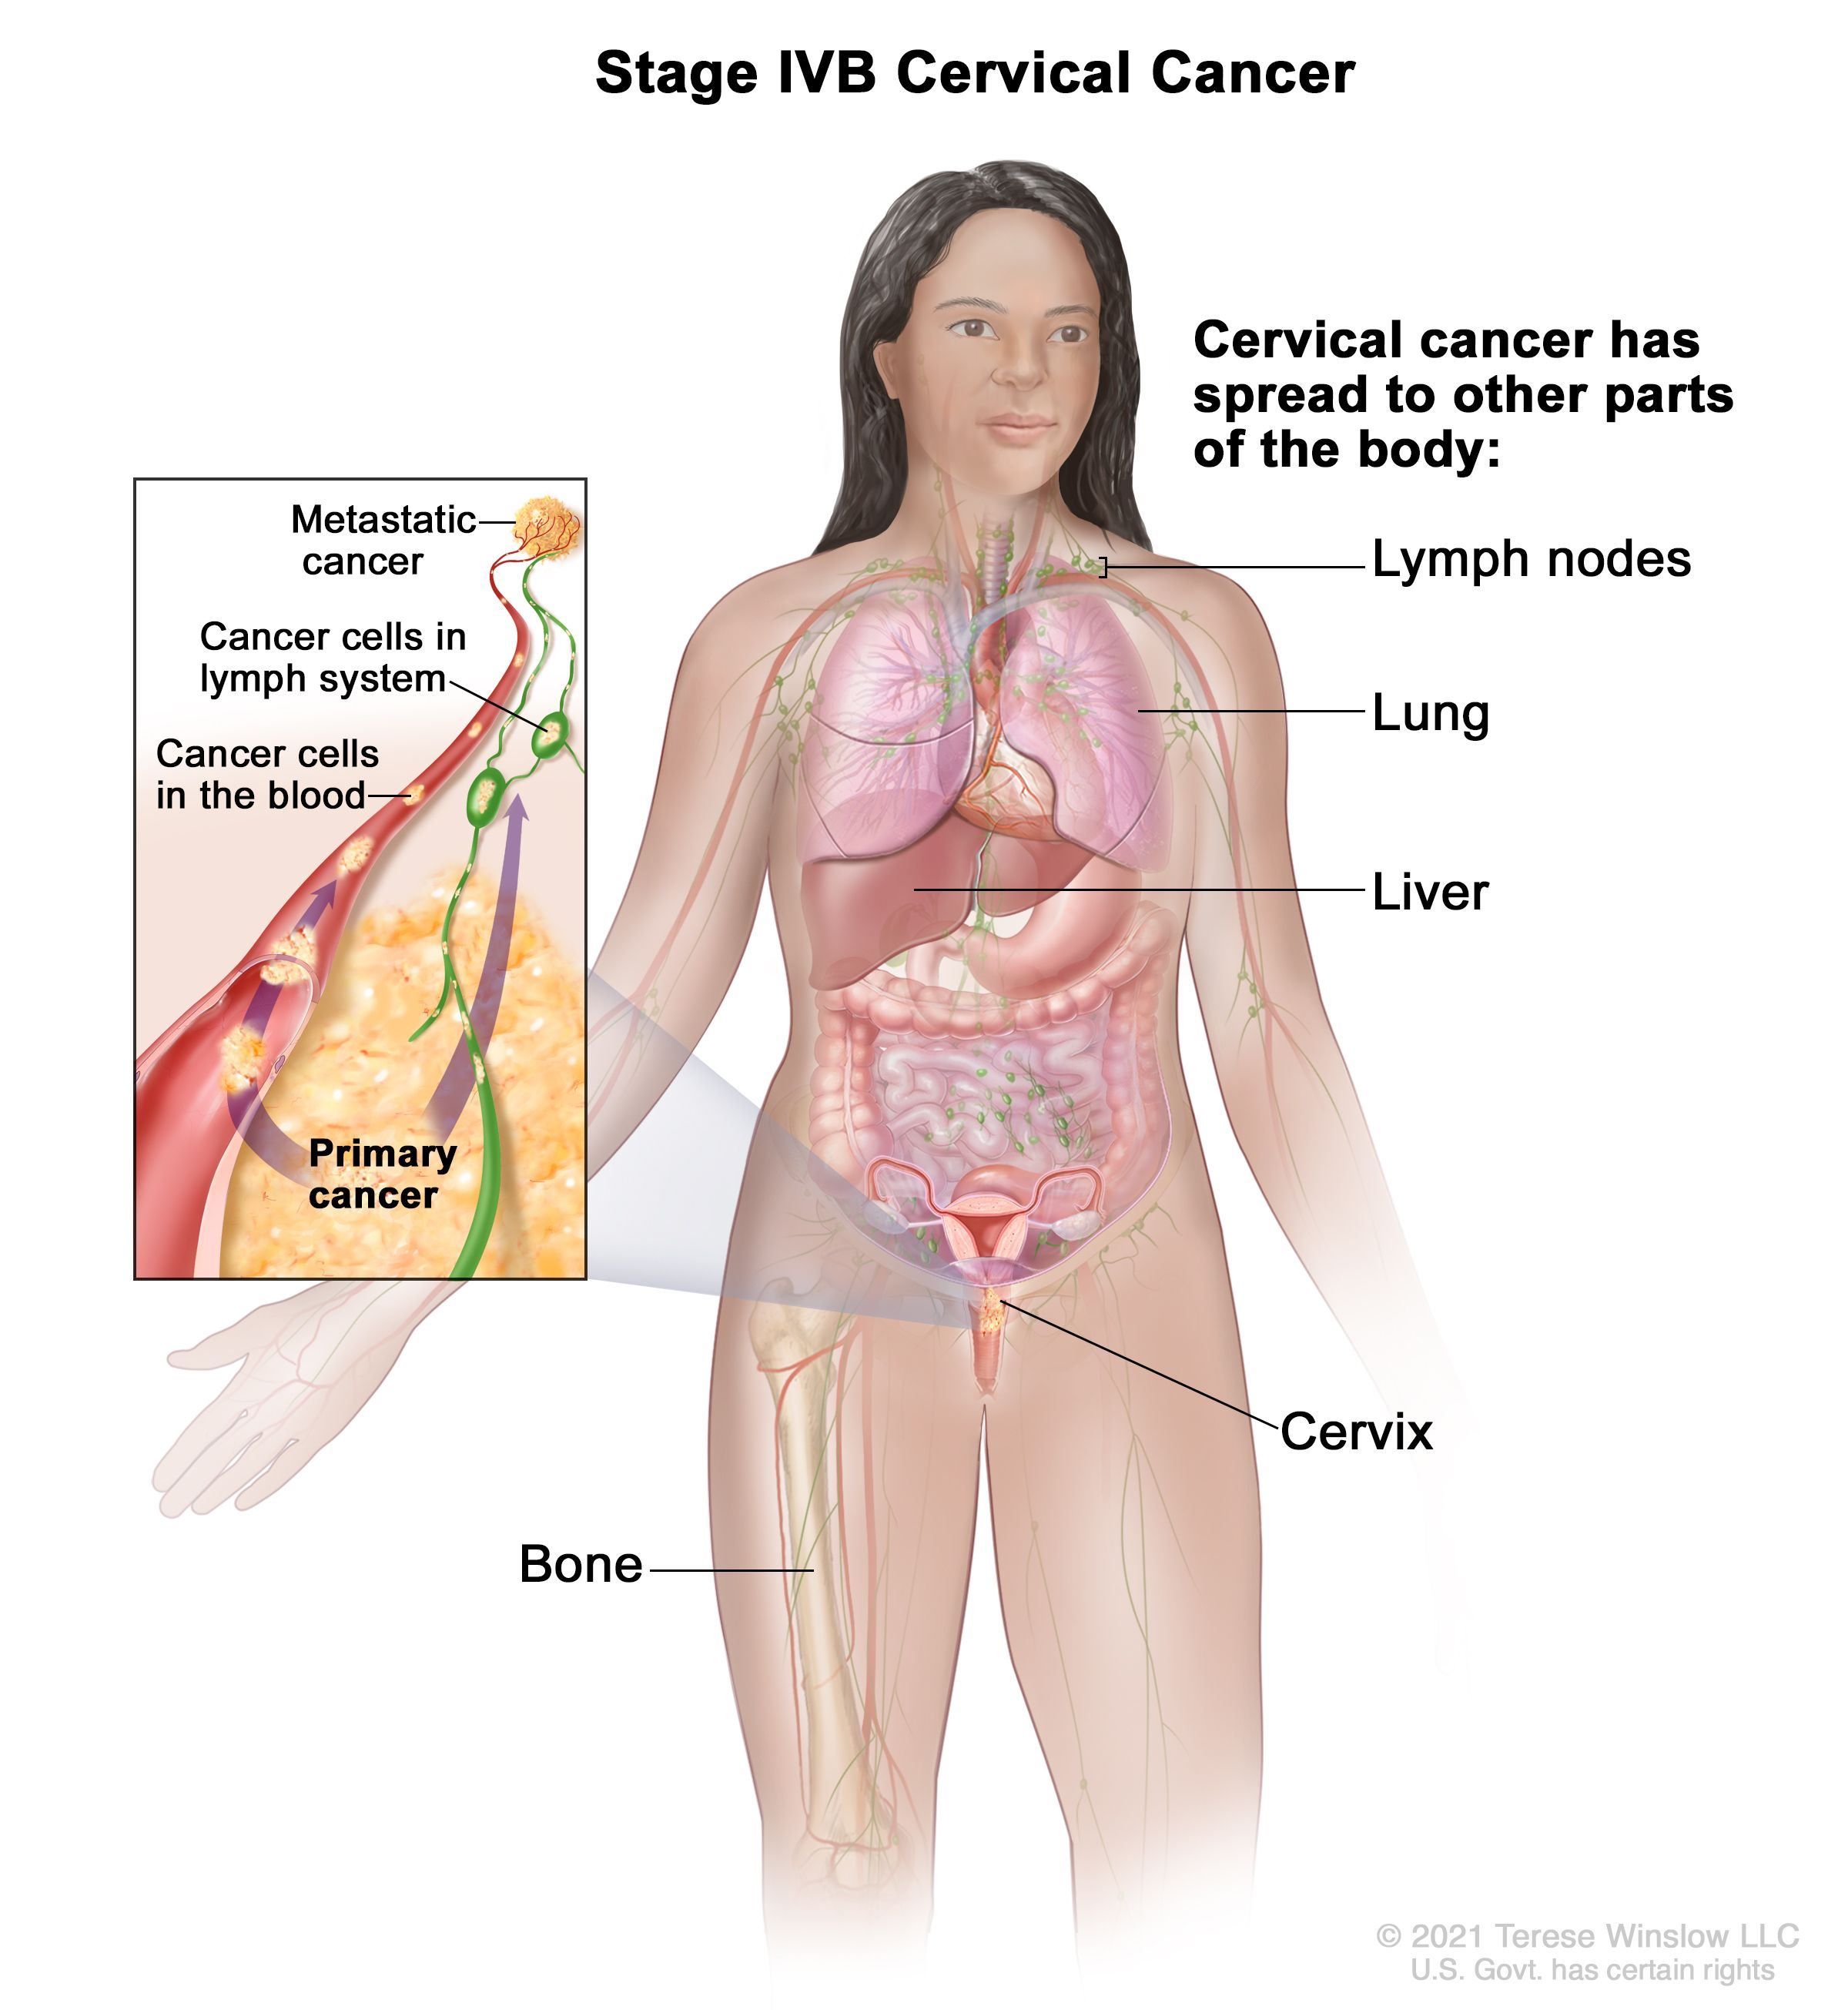 Cervical Cancer Treatment Robert H Lurie Comprehensive Cancer Center Of Northwestern University Feinberg School Of Medicine Northwestern University